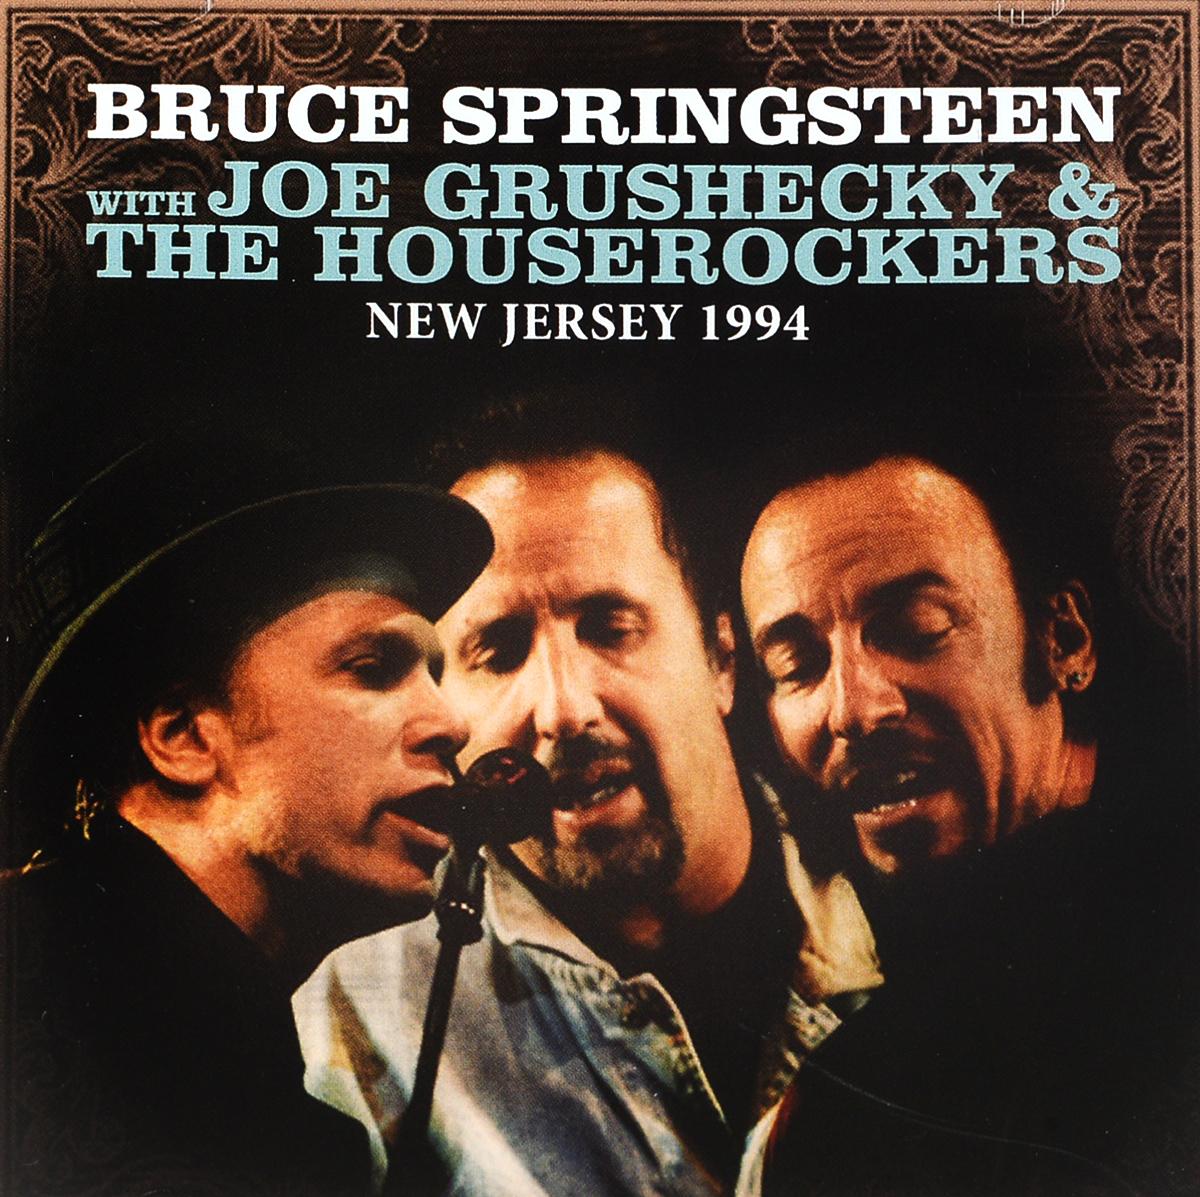 Брюс Спрингстин,The Houserockers Bruce Springsteen. New Jersey 1994 брюс спрингстин bruce springsteen passaic night 1978 the classic new jersey broadcast volume two 2 lp